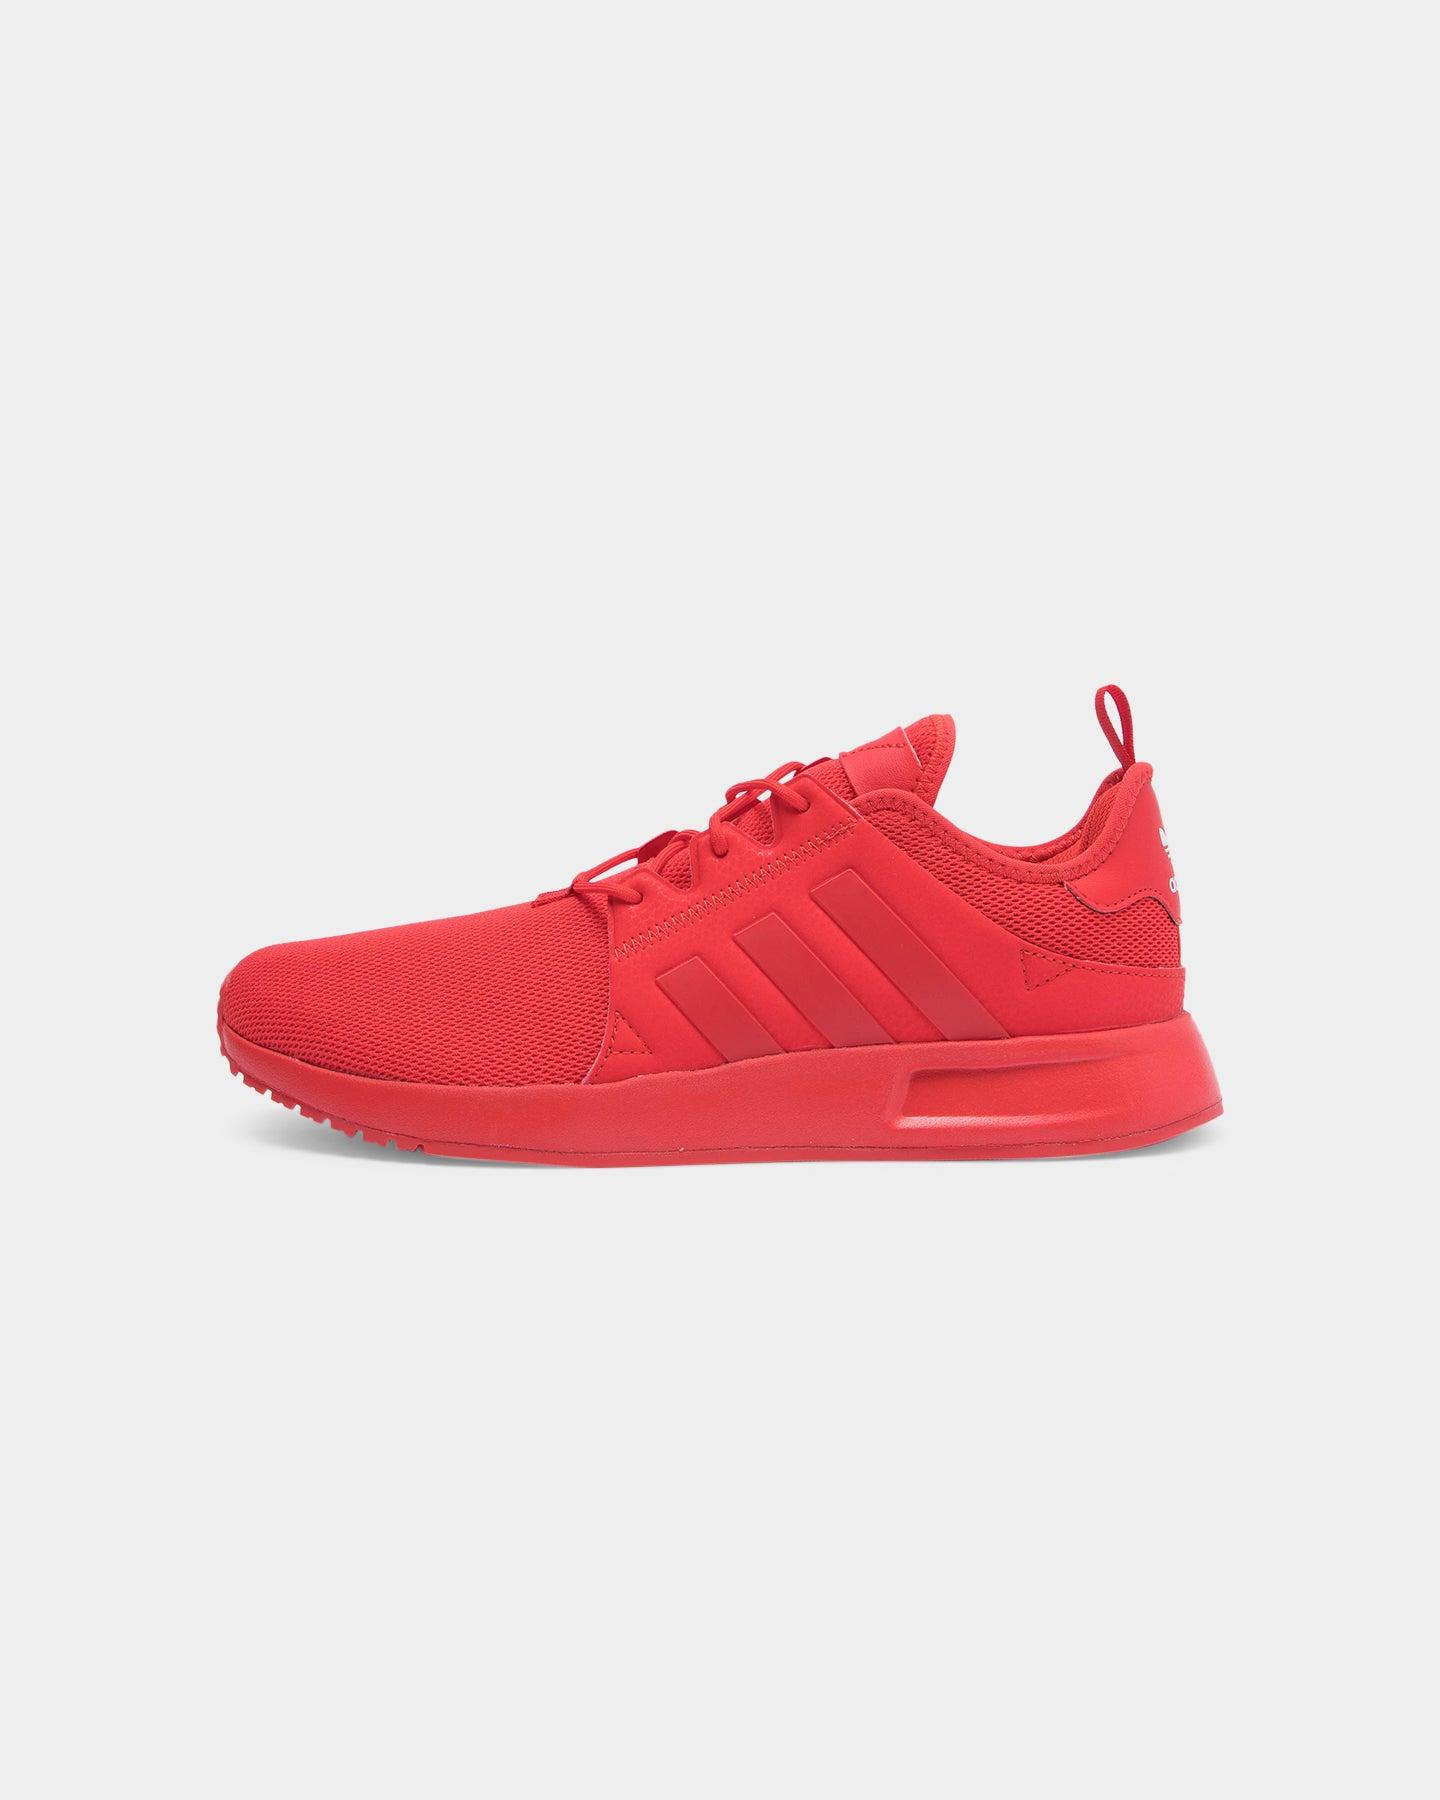 Adidas X_PLR Triple Red | Culture Kings